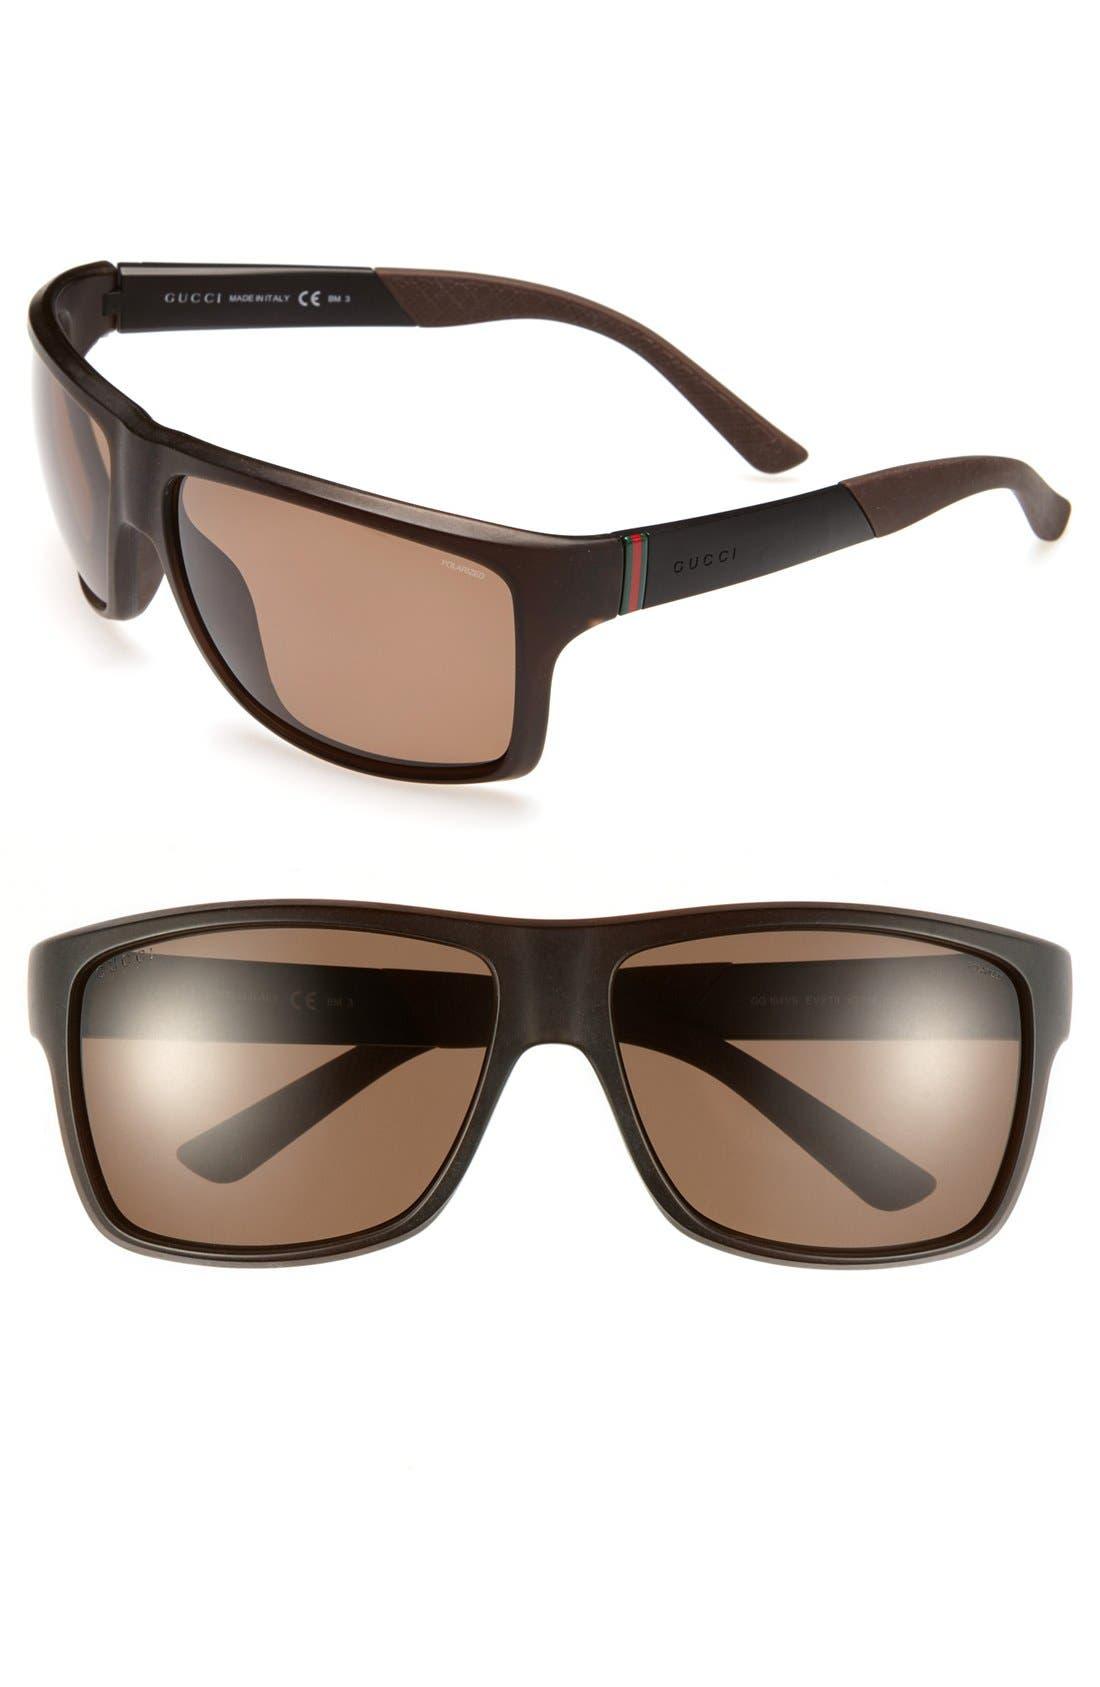 Main Image - Gucci 62mm Polarized Sunglasses